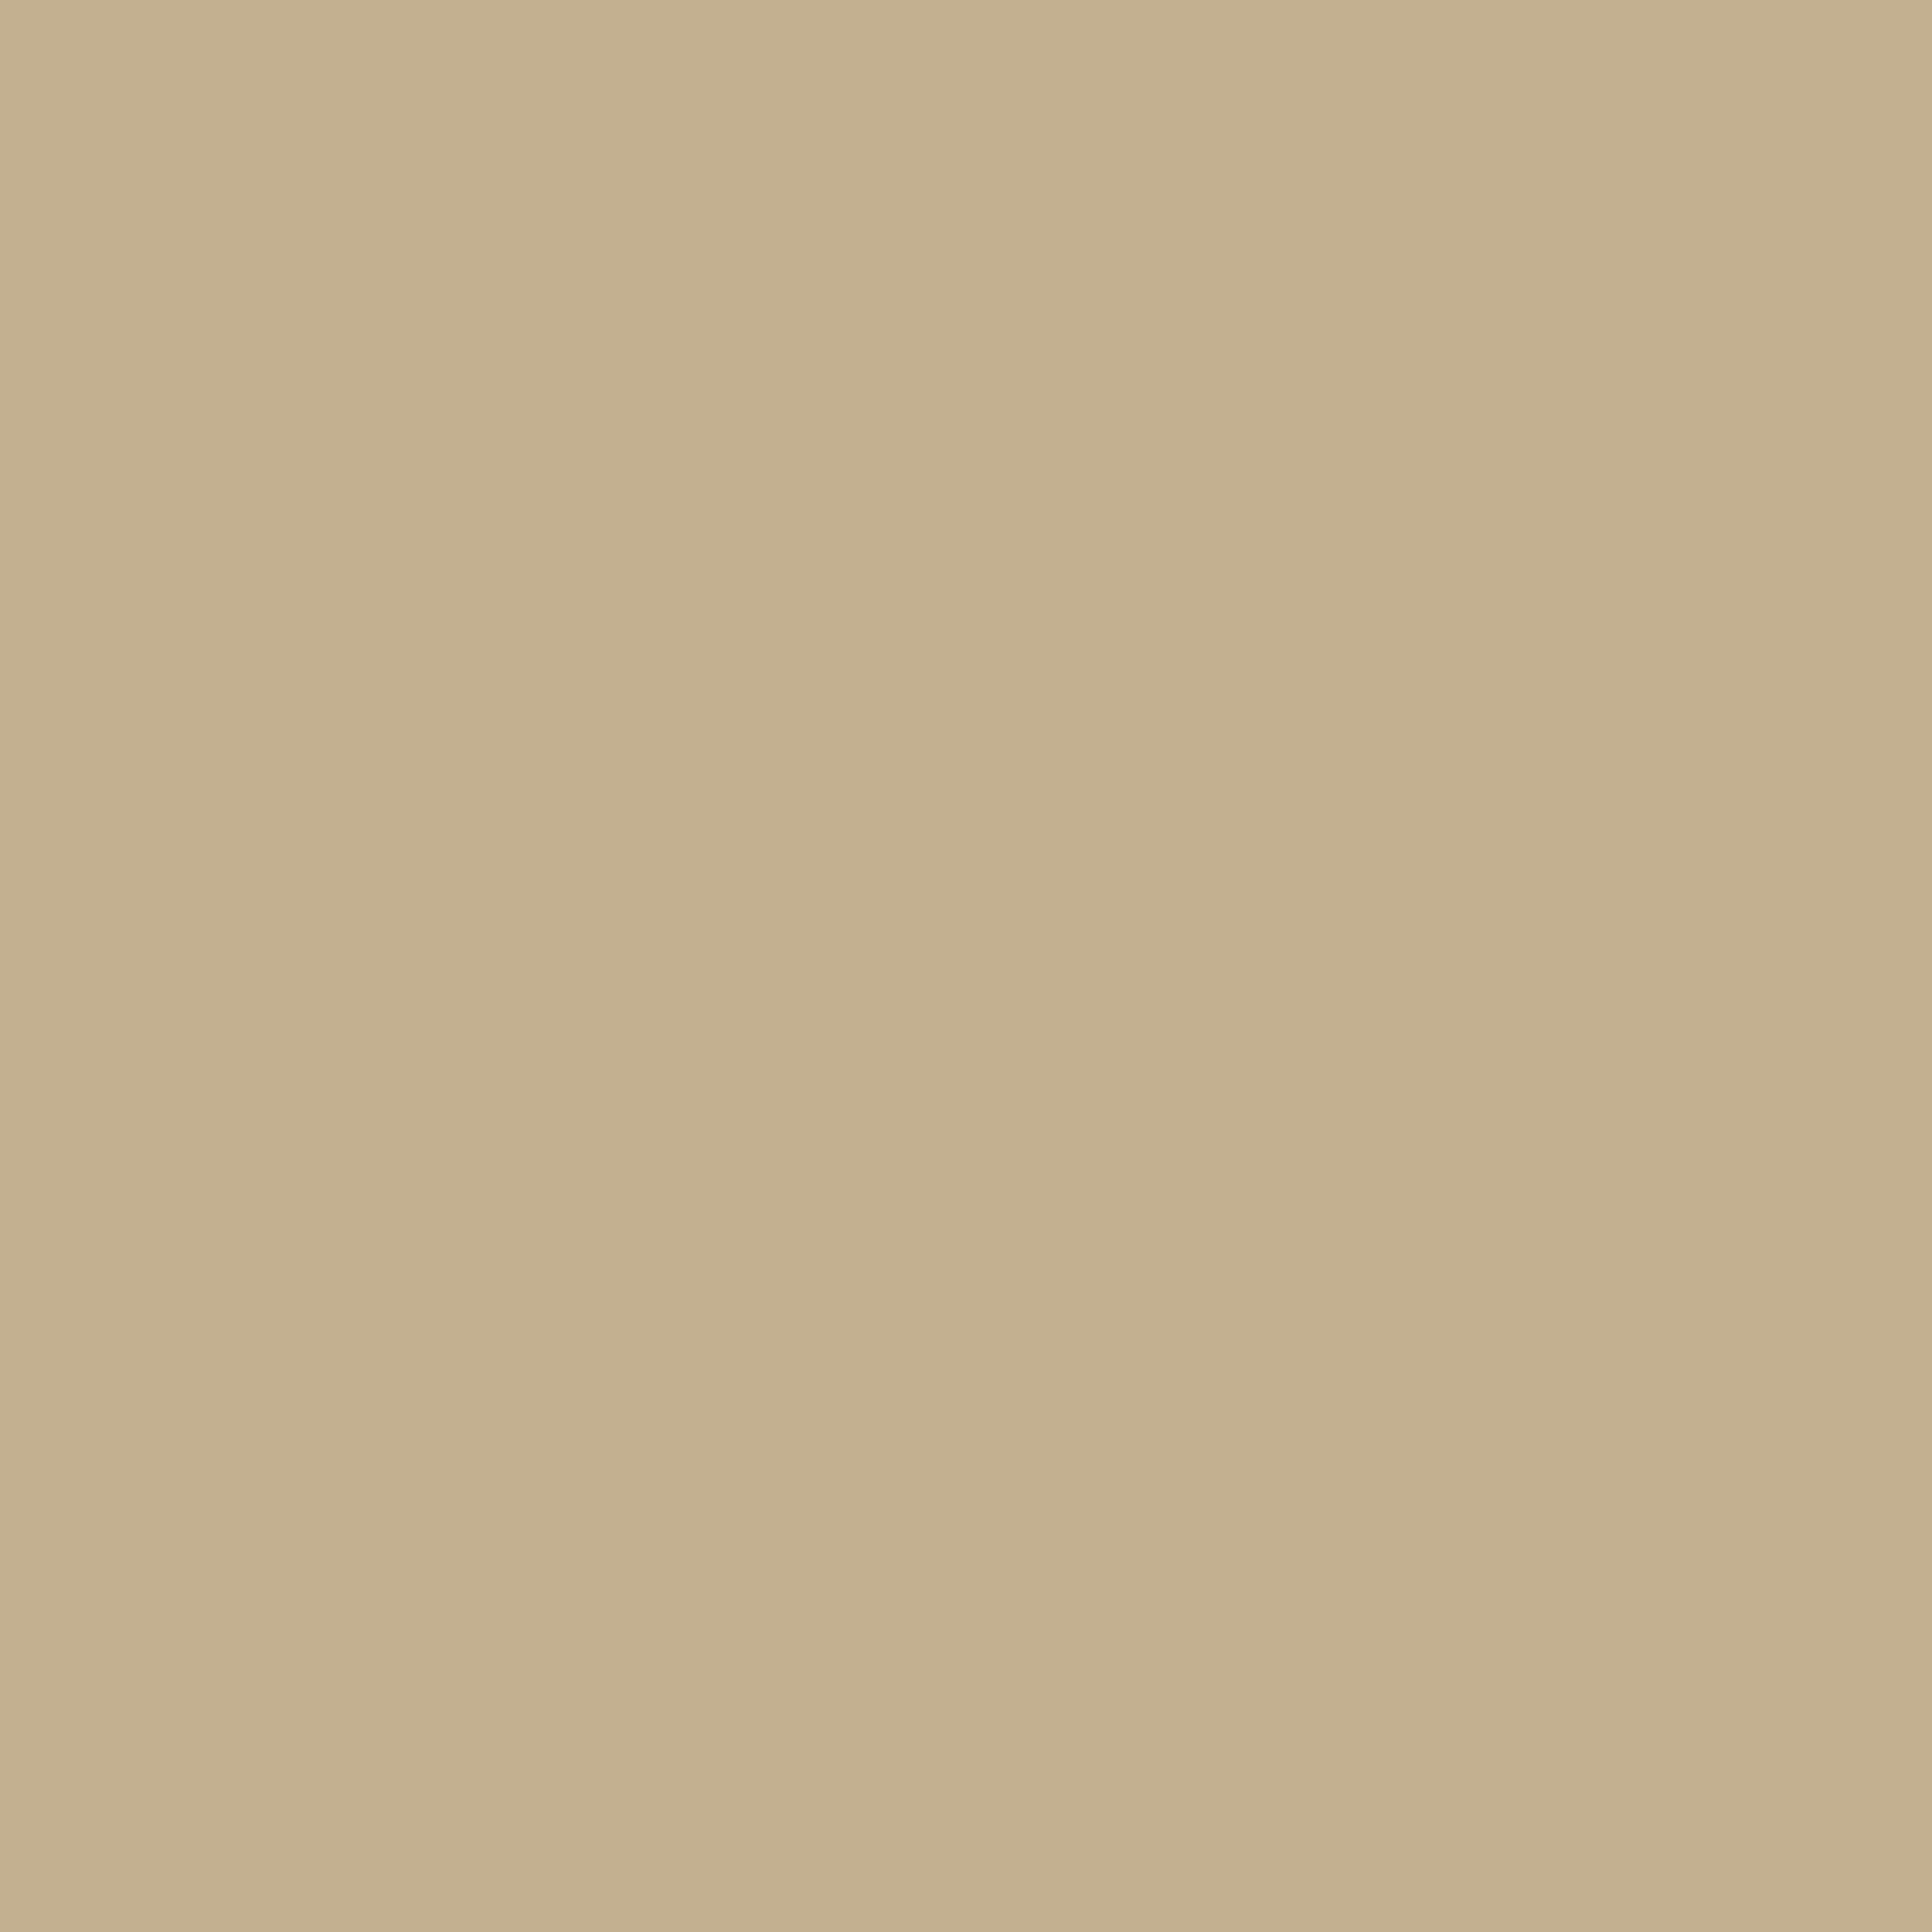 2048x2048 Khaki Web Solid Color Background